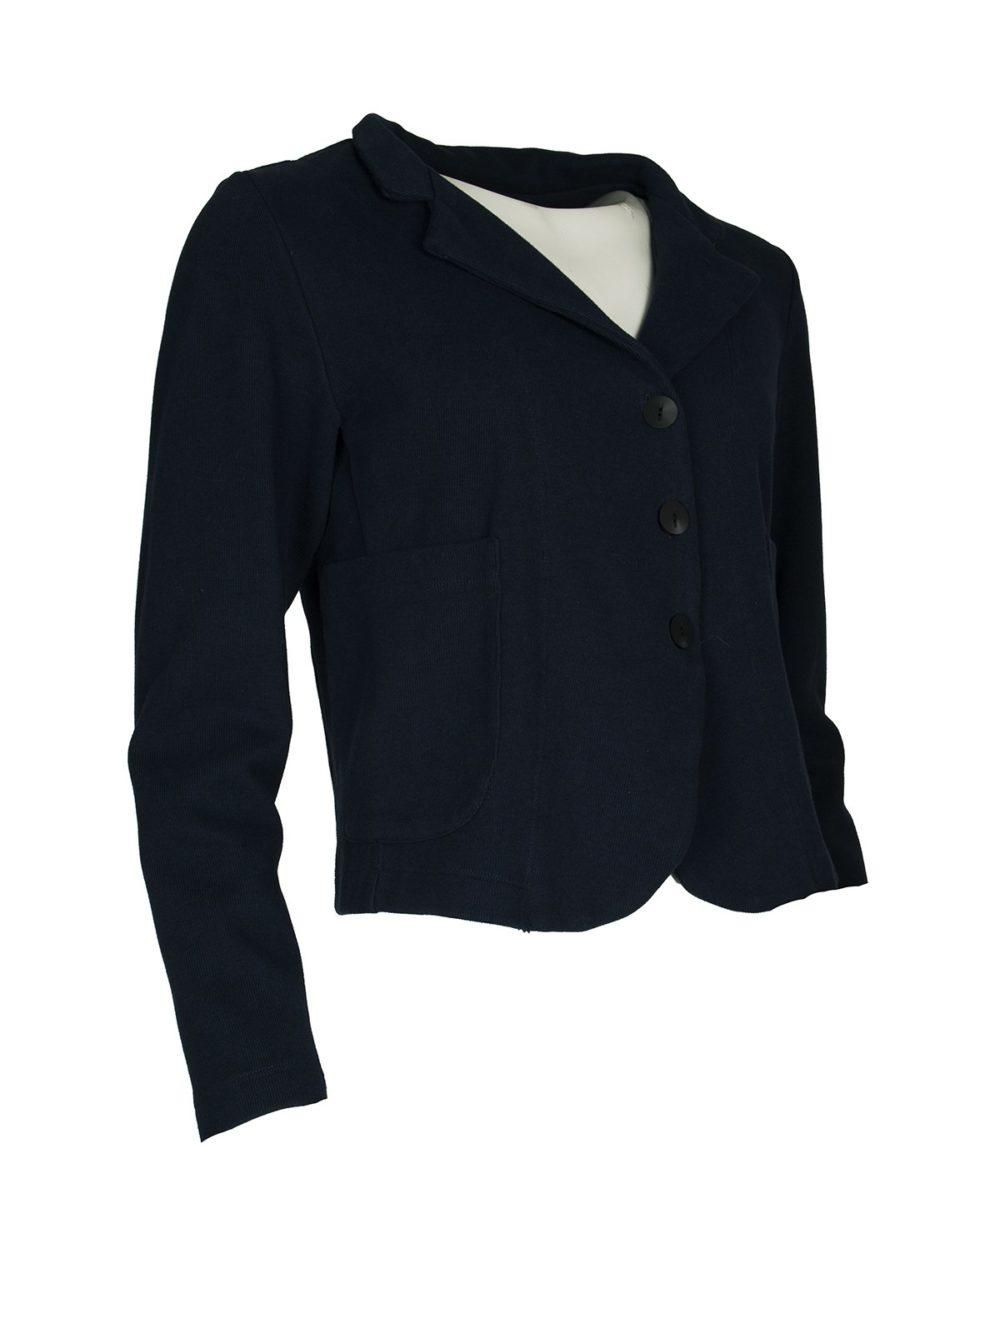 Jacket 7844 Grizas Katie Kerr Women's Clothing